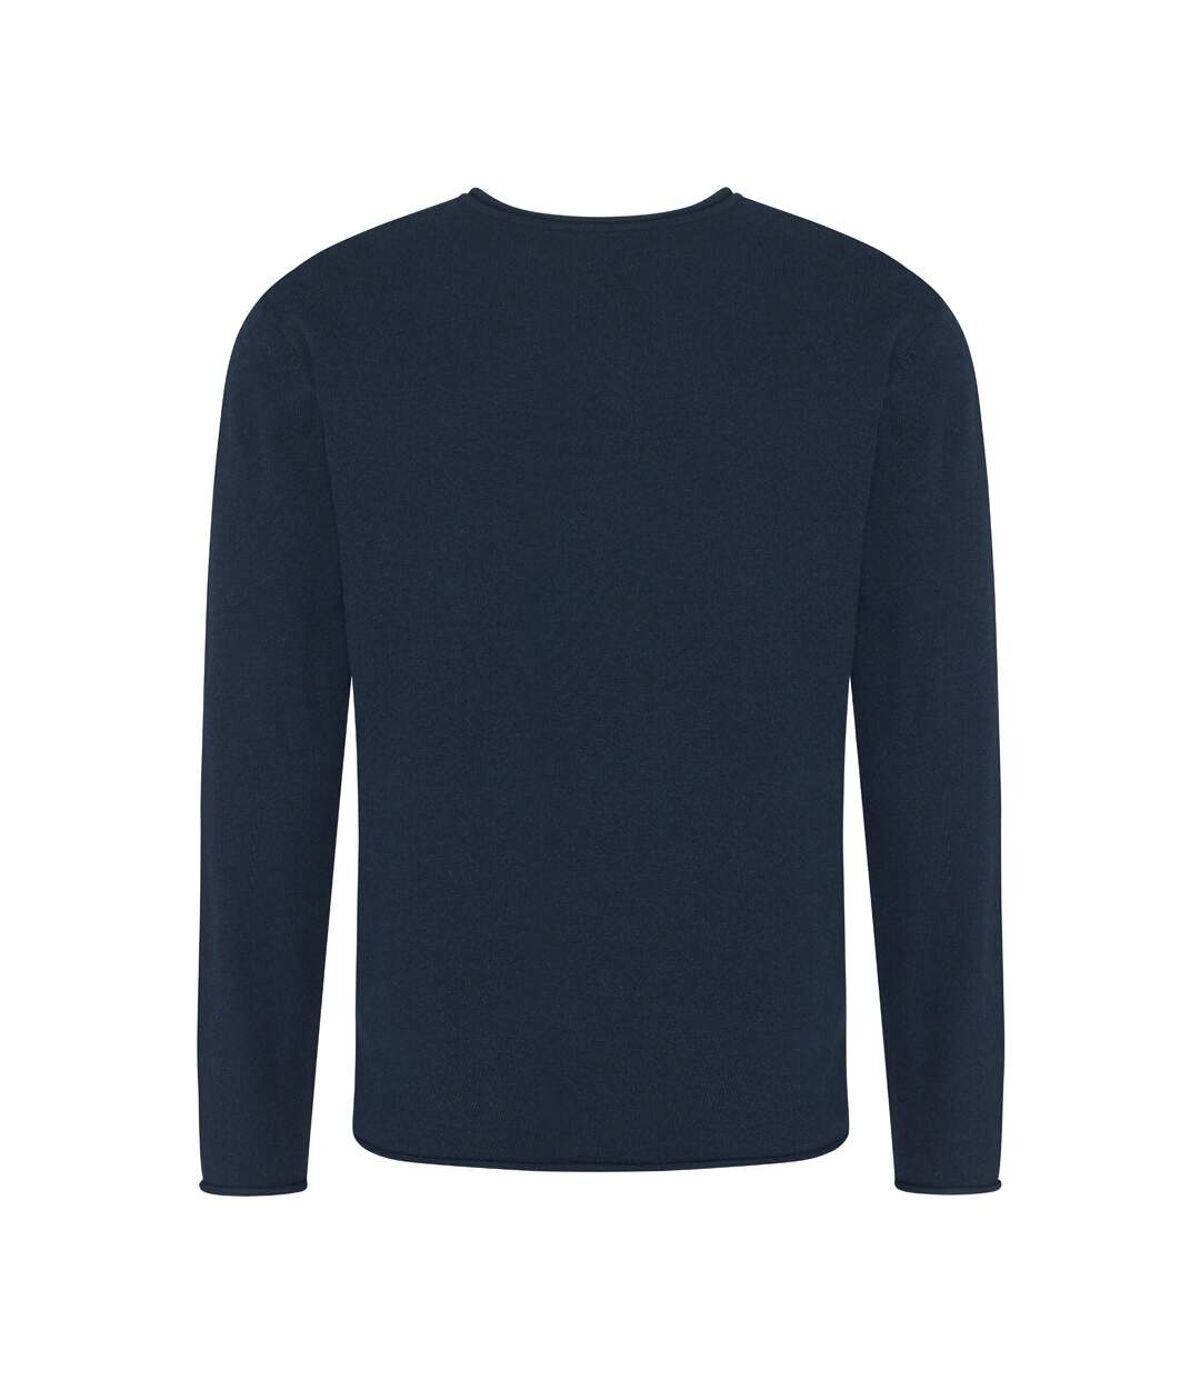 Ecologie Mens Arenal Lightweight Sweater (Navy) - UTPC3064